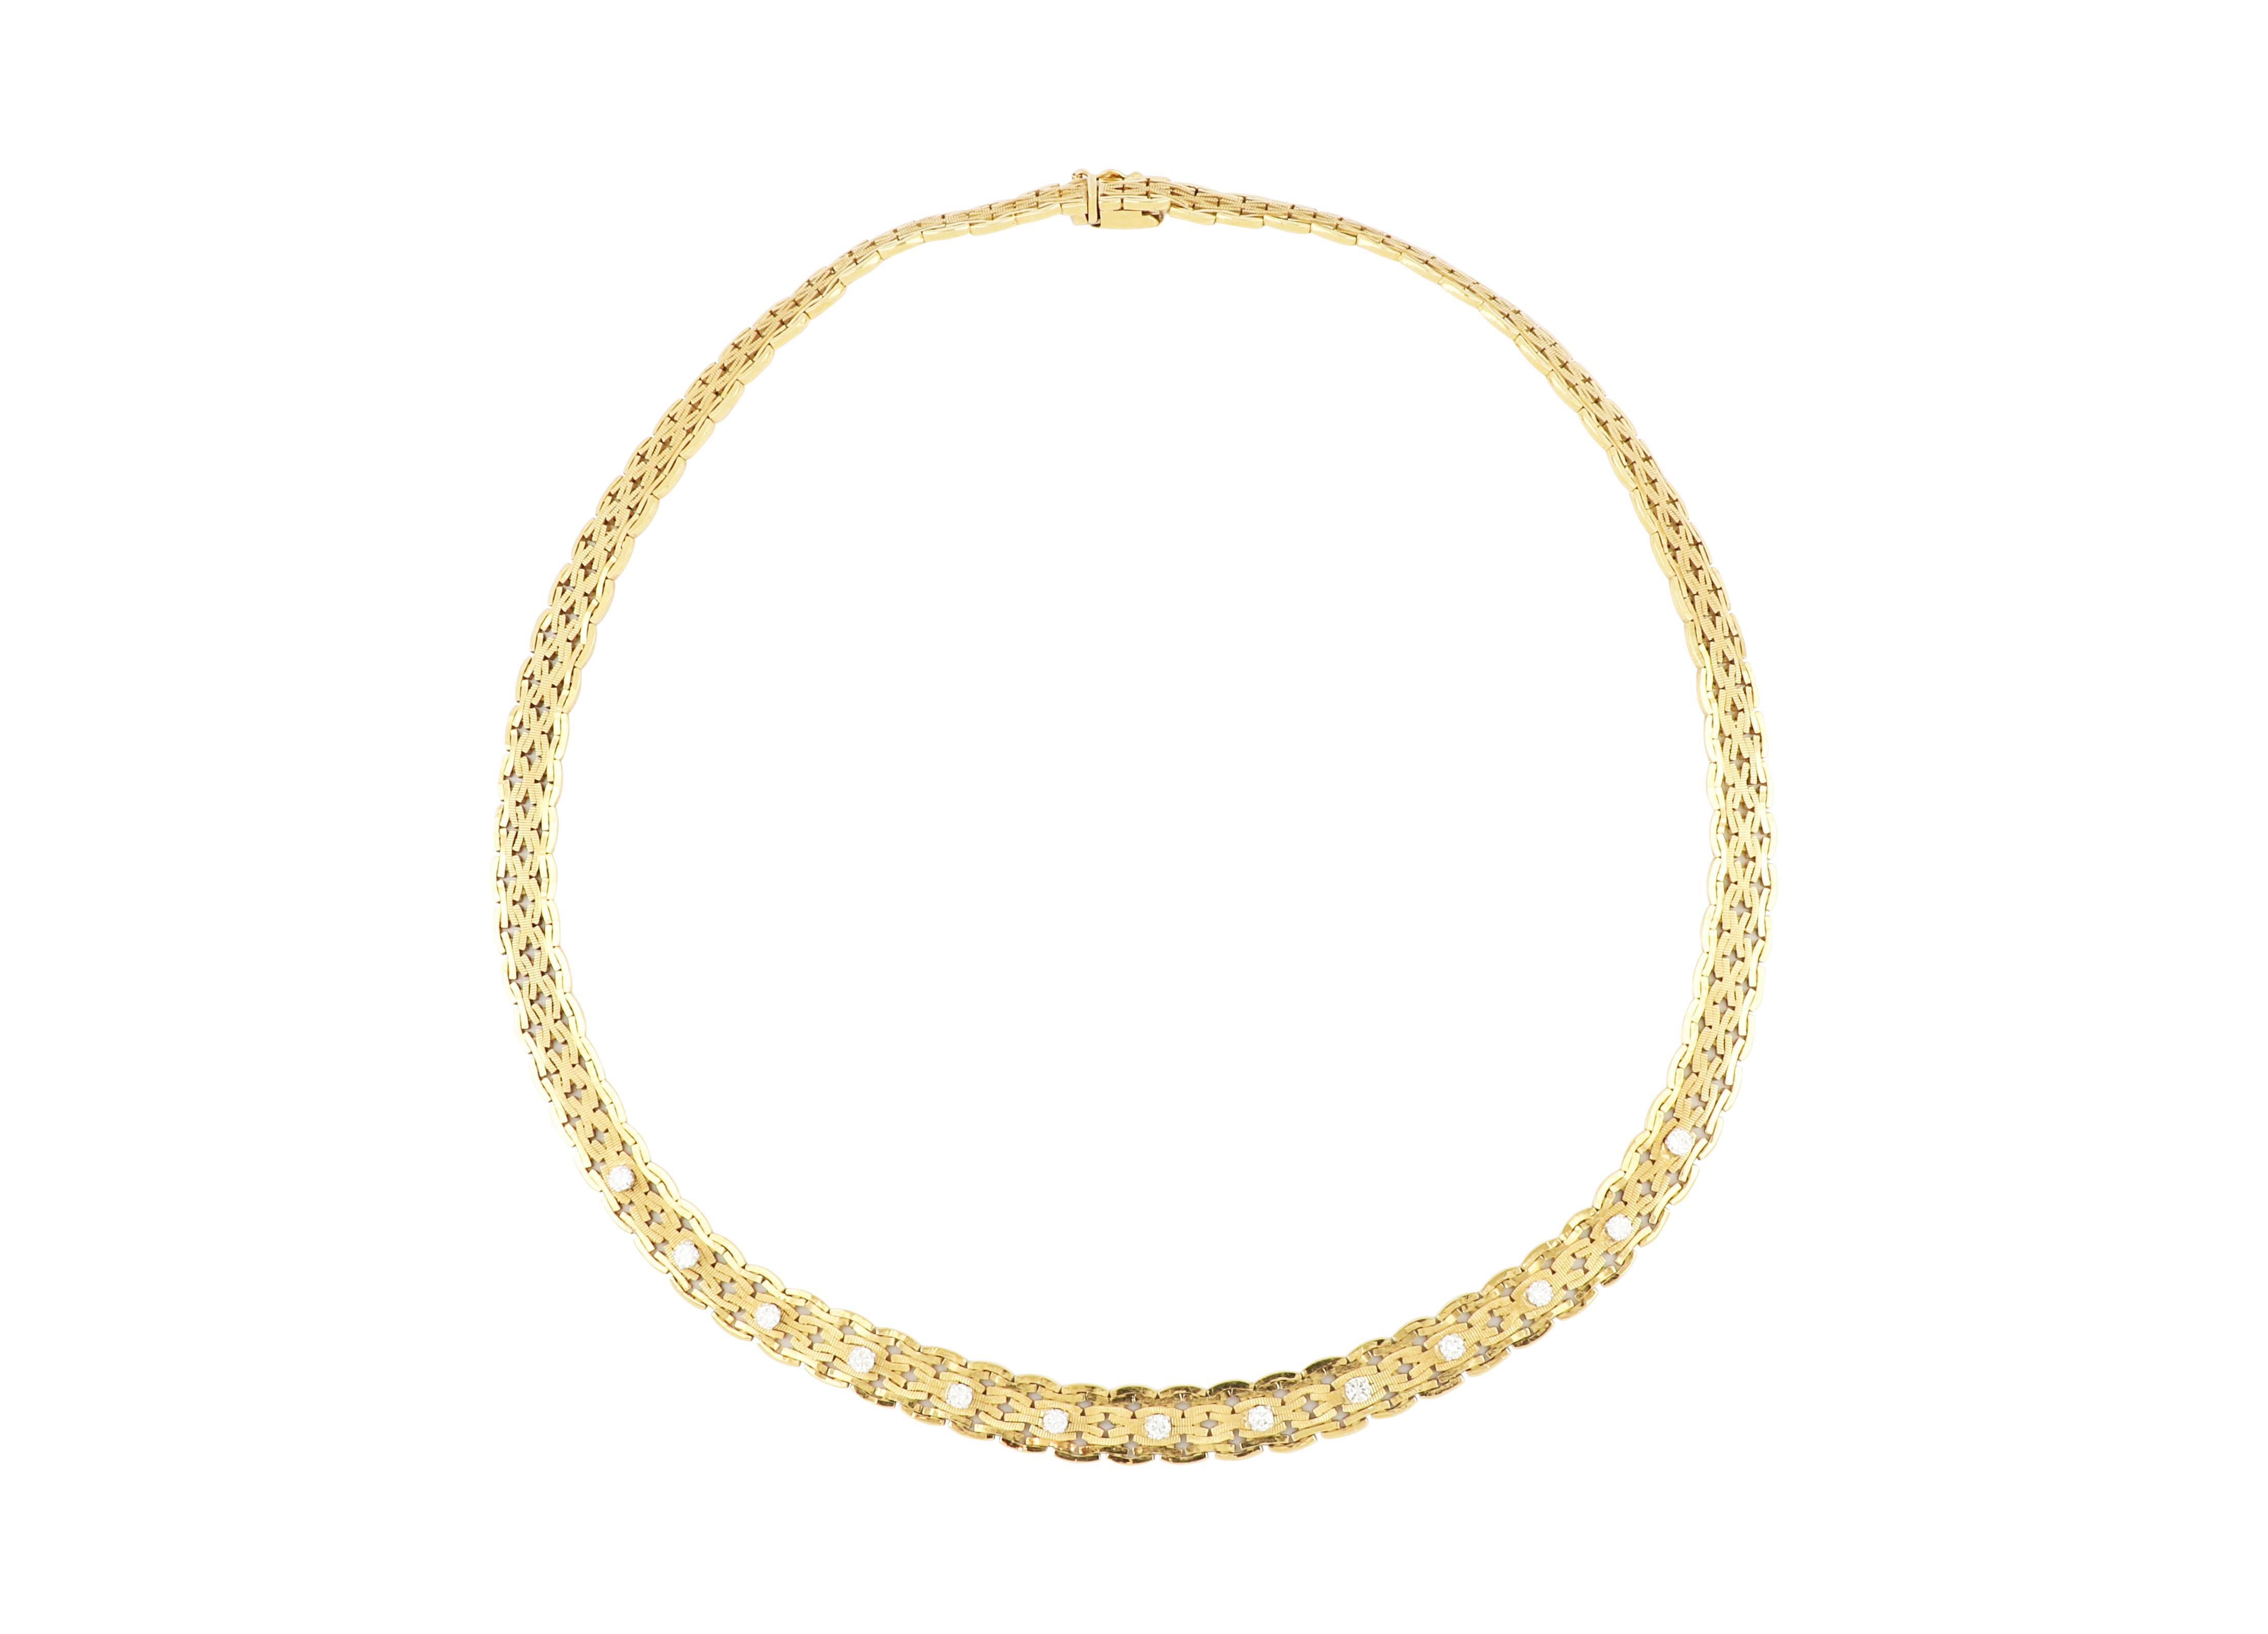 18ct gold & diamond woven design necklace